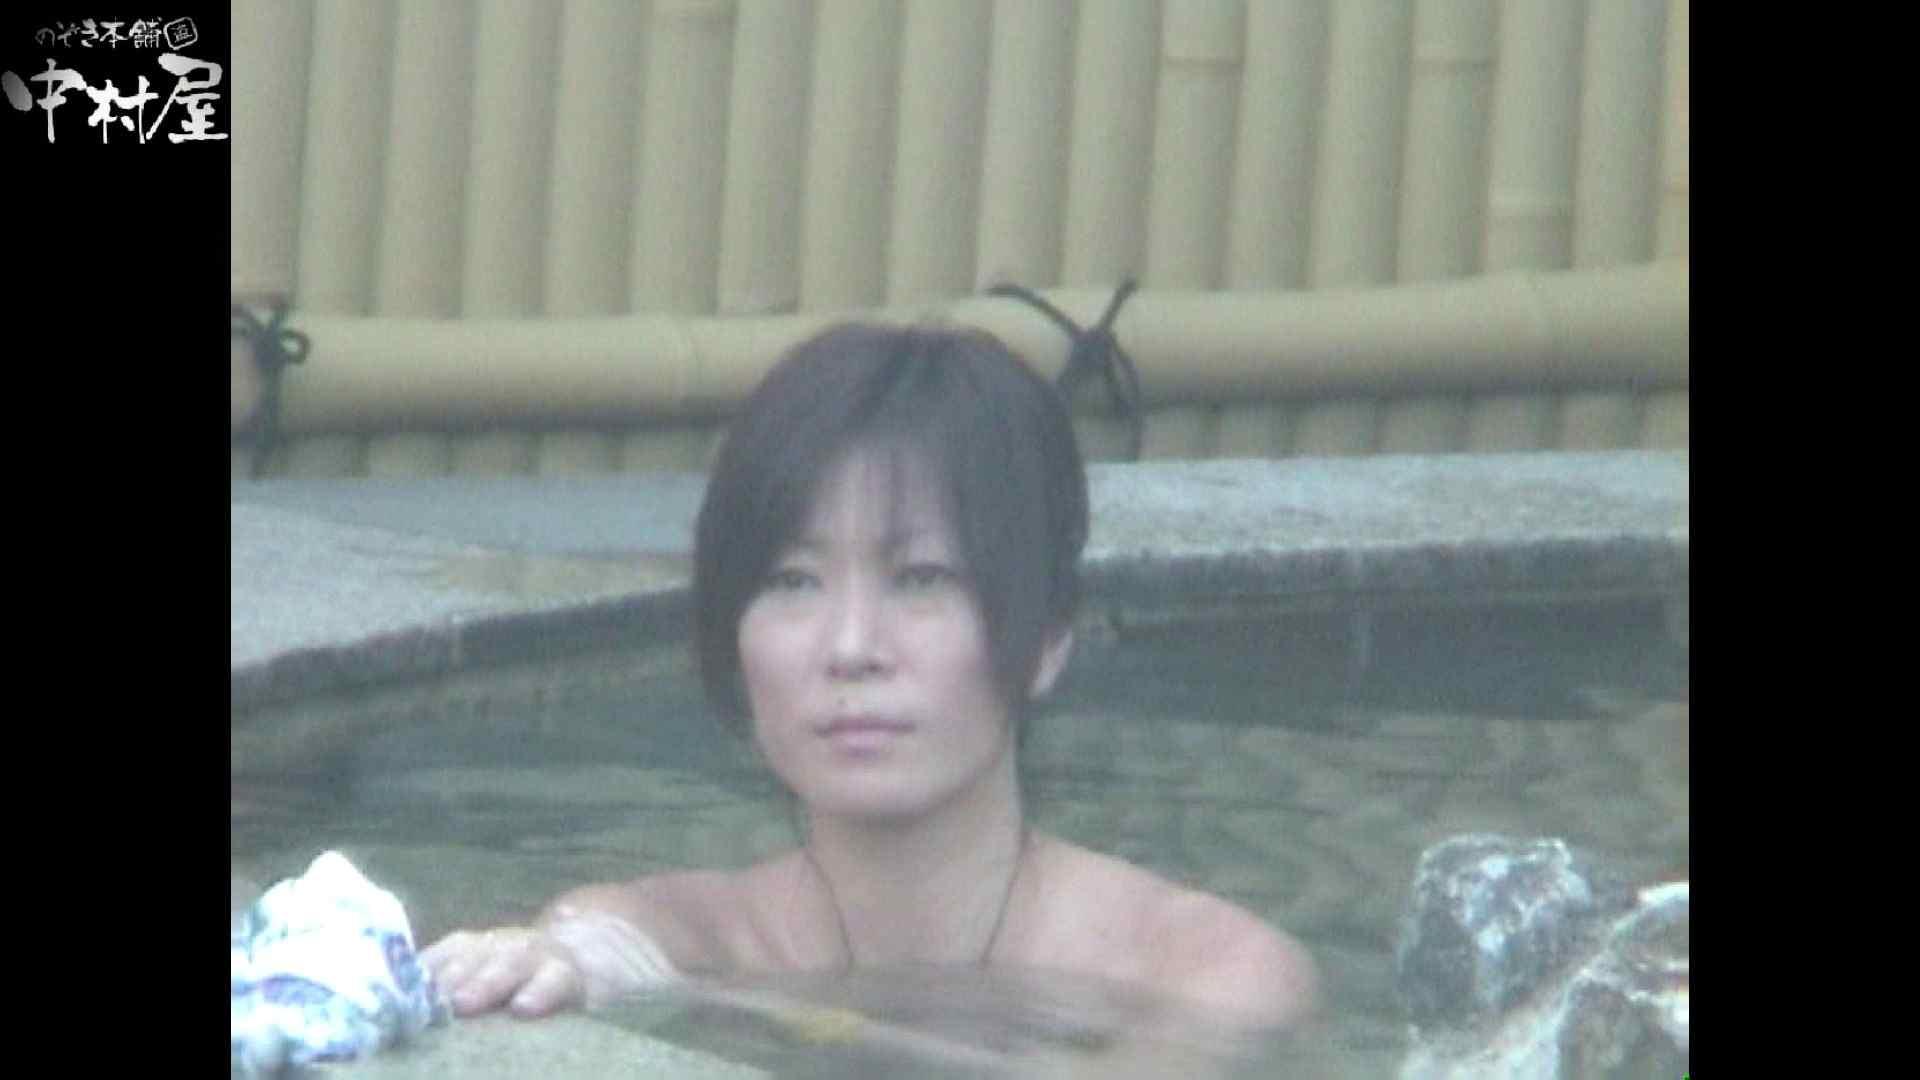 Aquaな露天風呂Vol.972 盗撮 おまんこ動画流出 80画像 68